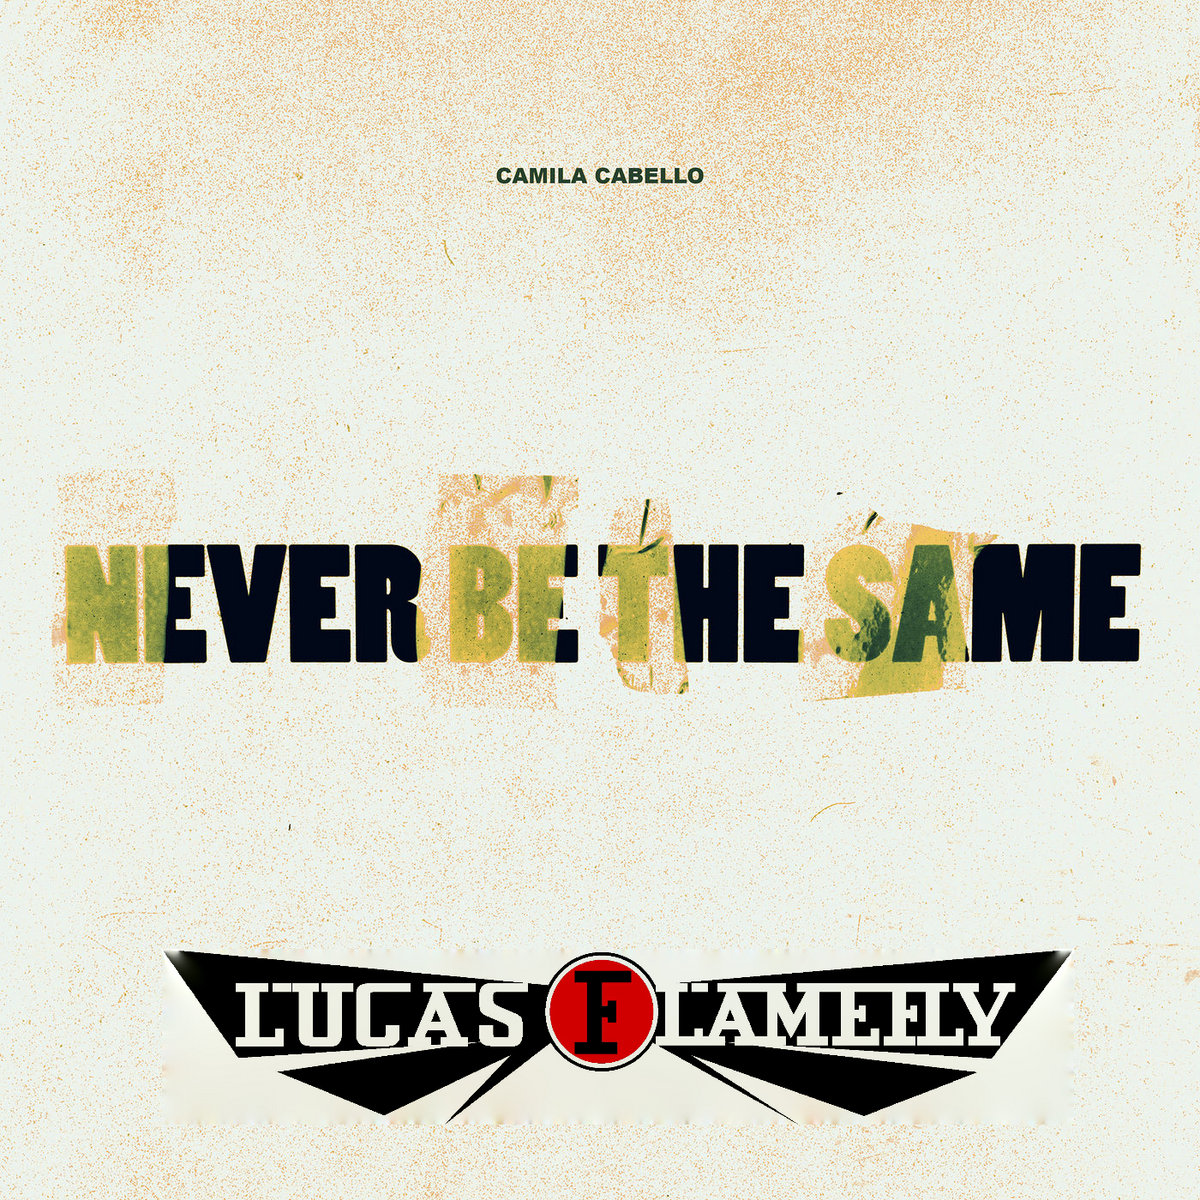 Camila Cabello - Never Be The Same (Lucas Flamefly Loverdose